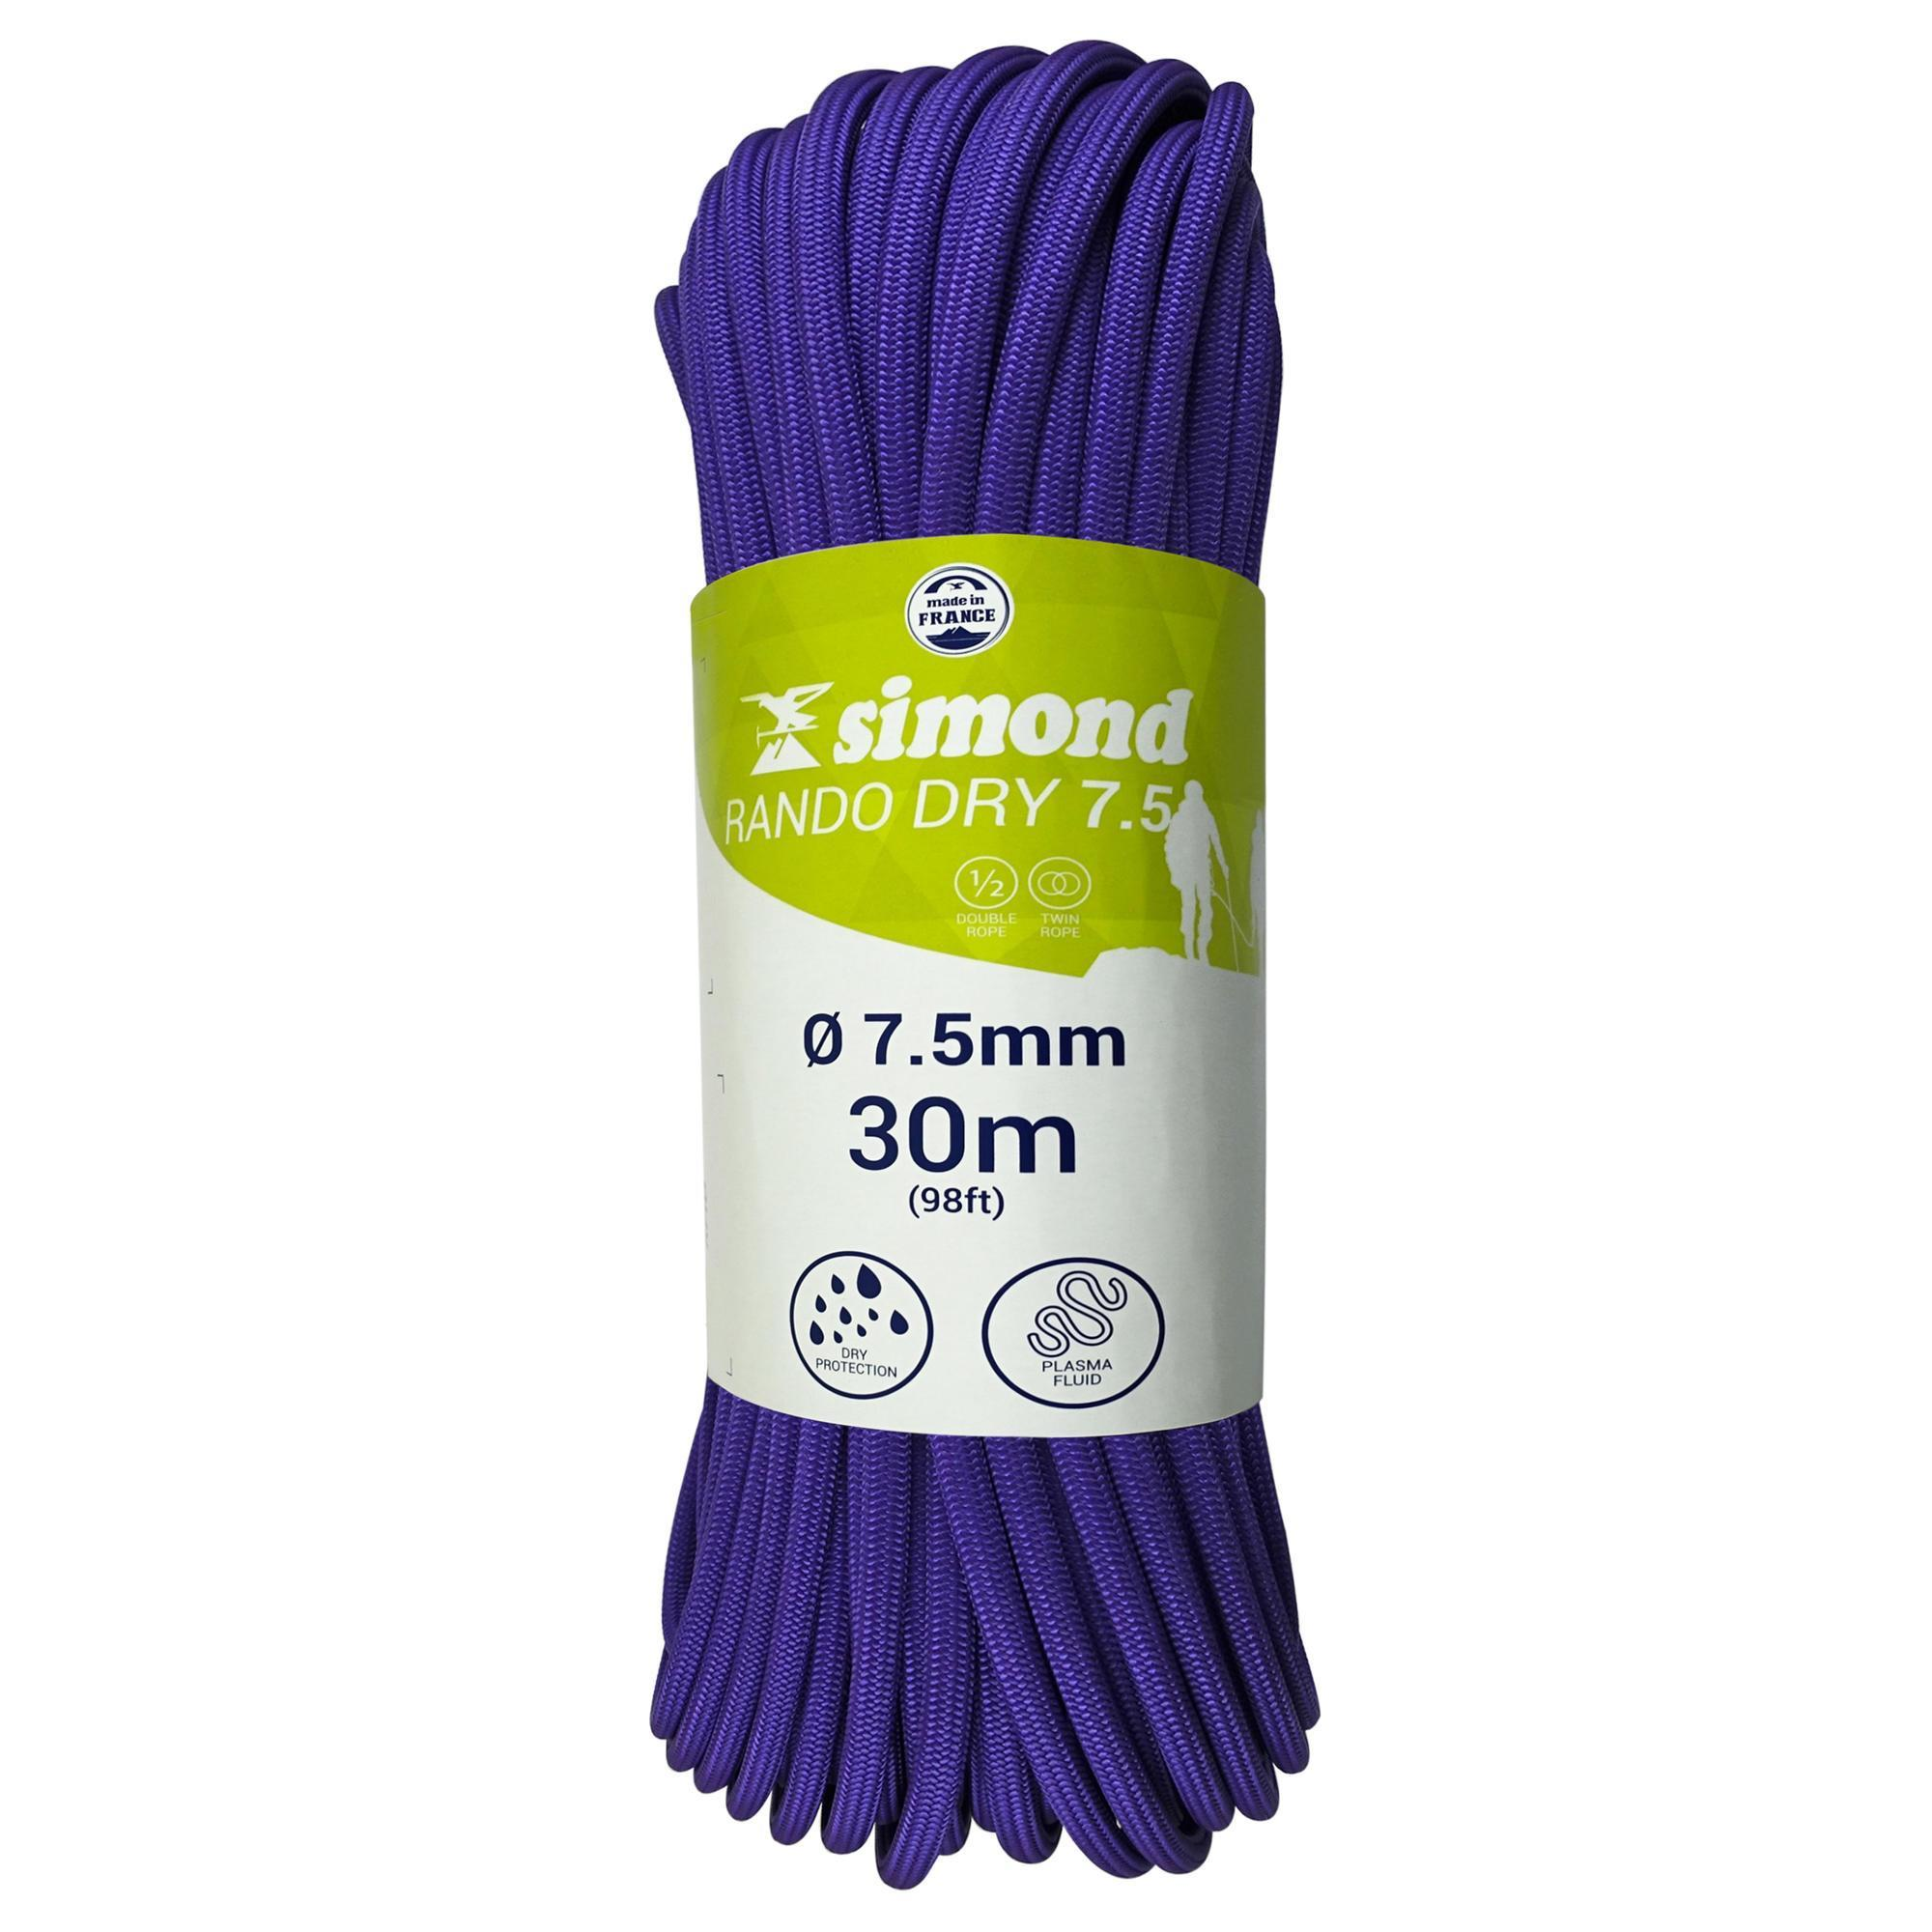 Simond Touw Rando Dry 7,5 mm x 30 m paars